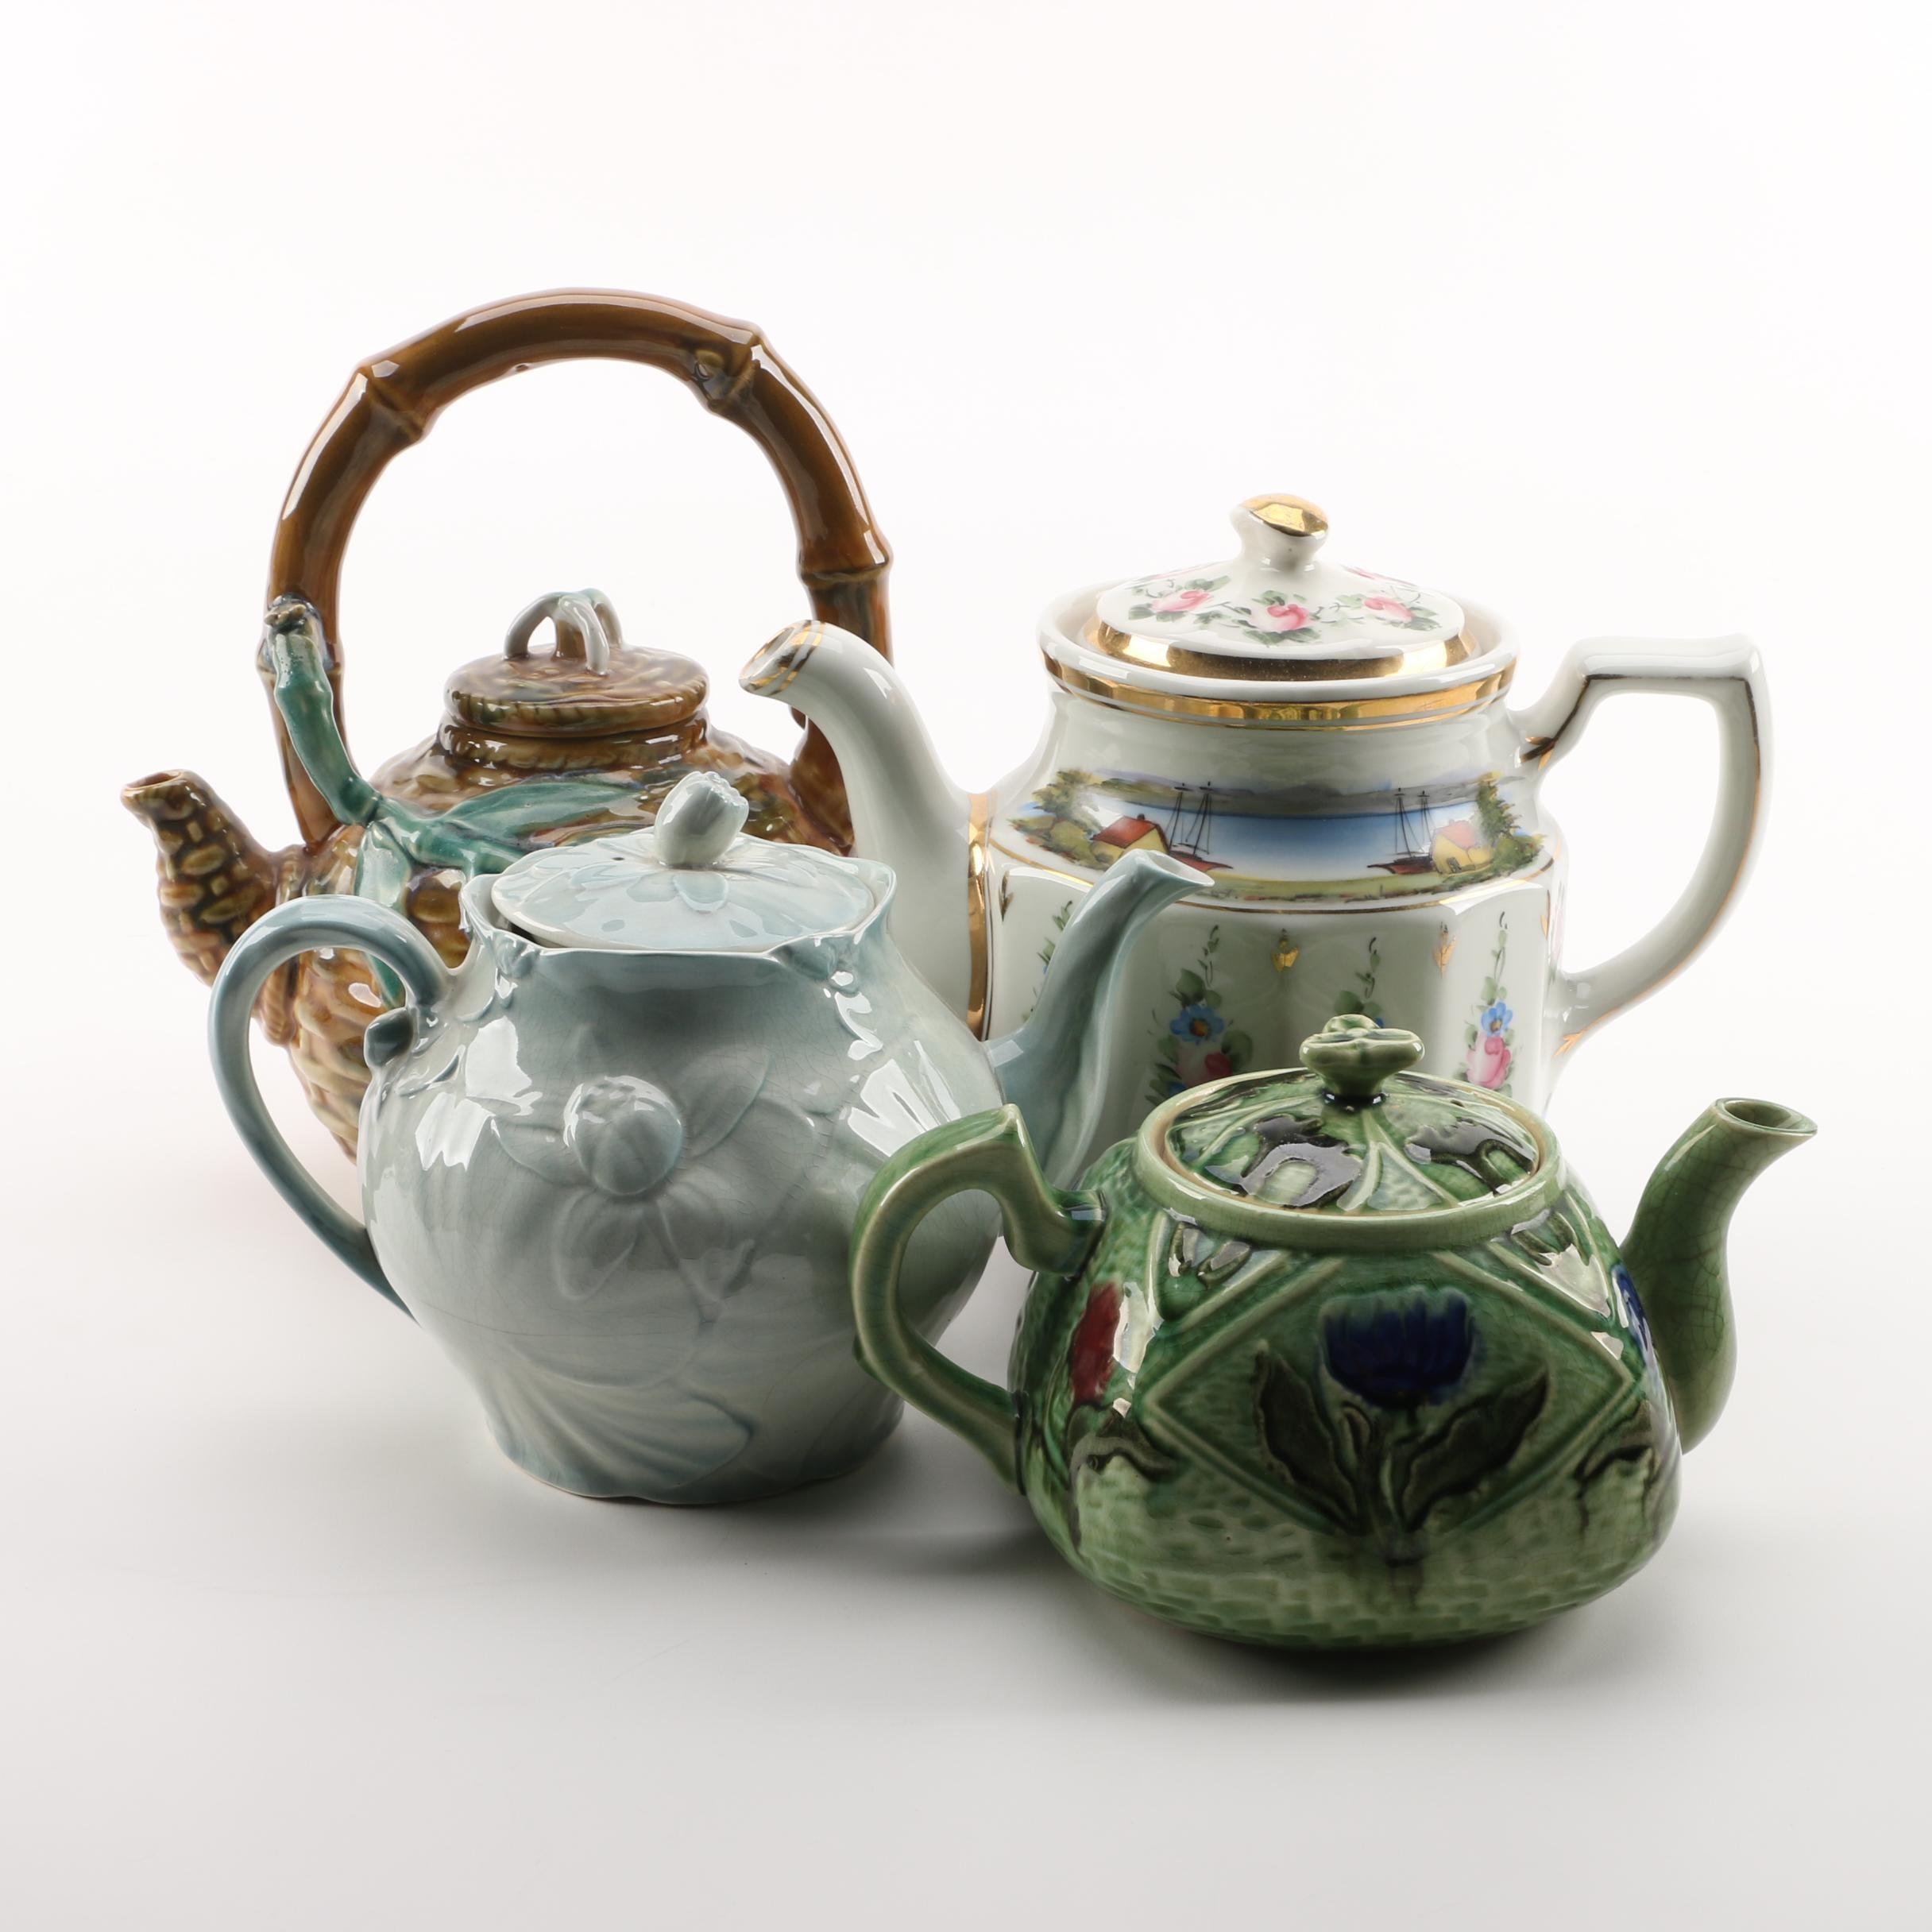 Ceramic Teapots Including Vintage Shenango China